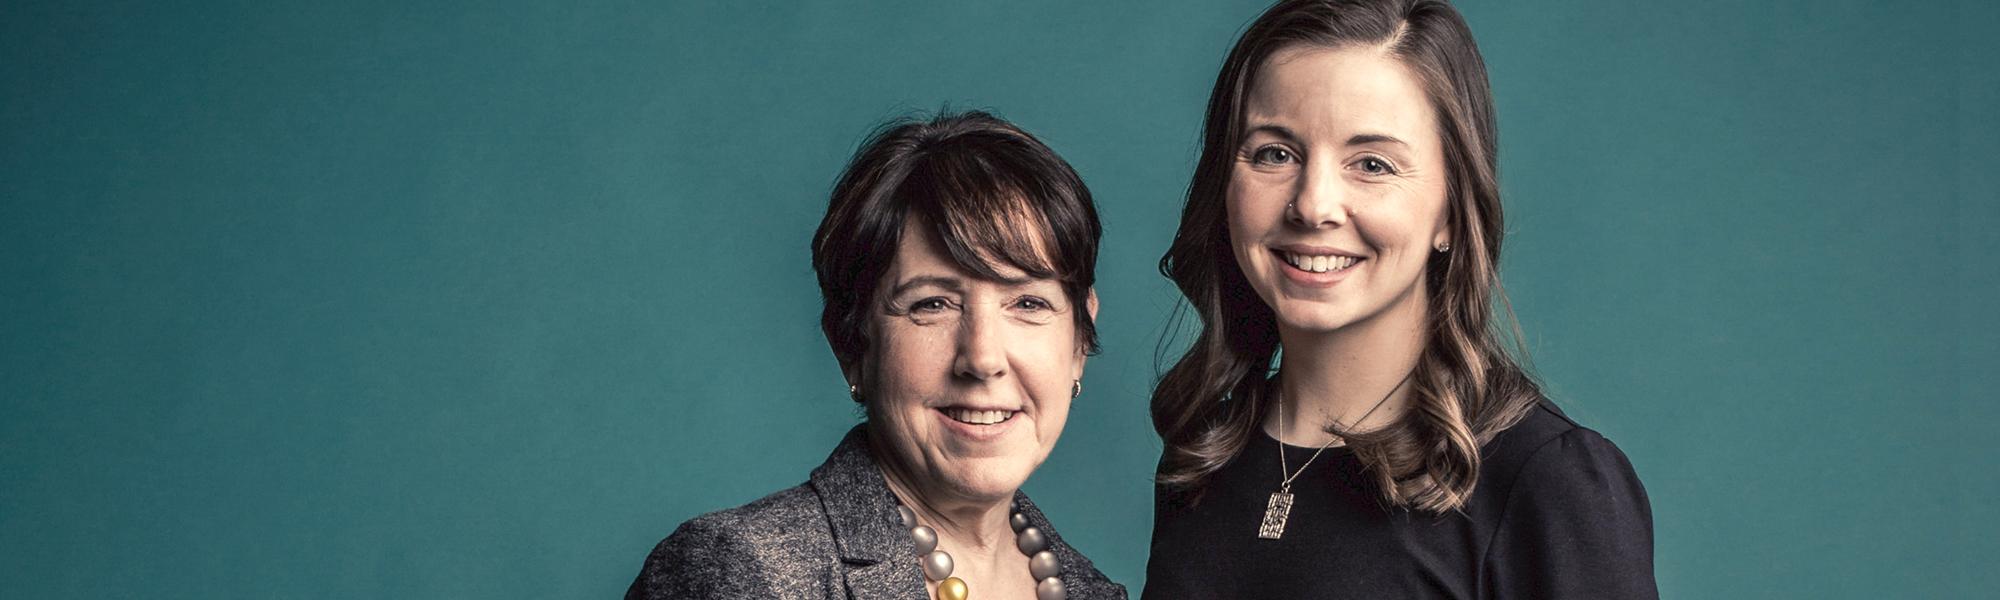 Debbie Walsh (left) and Kelly Dittmar